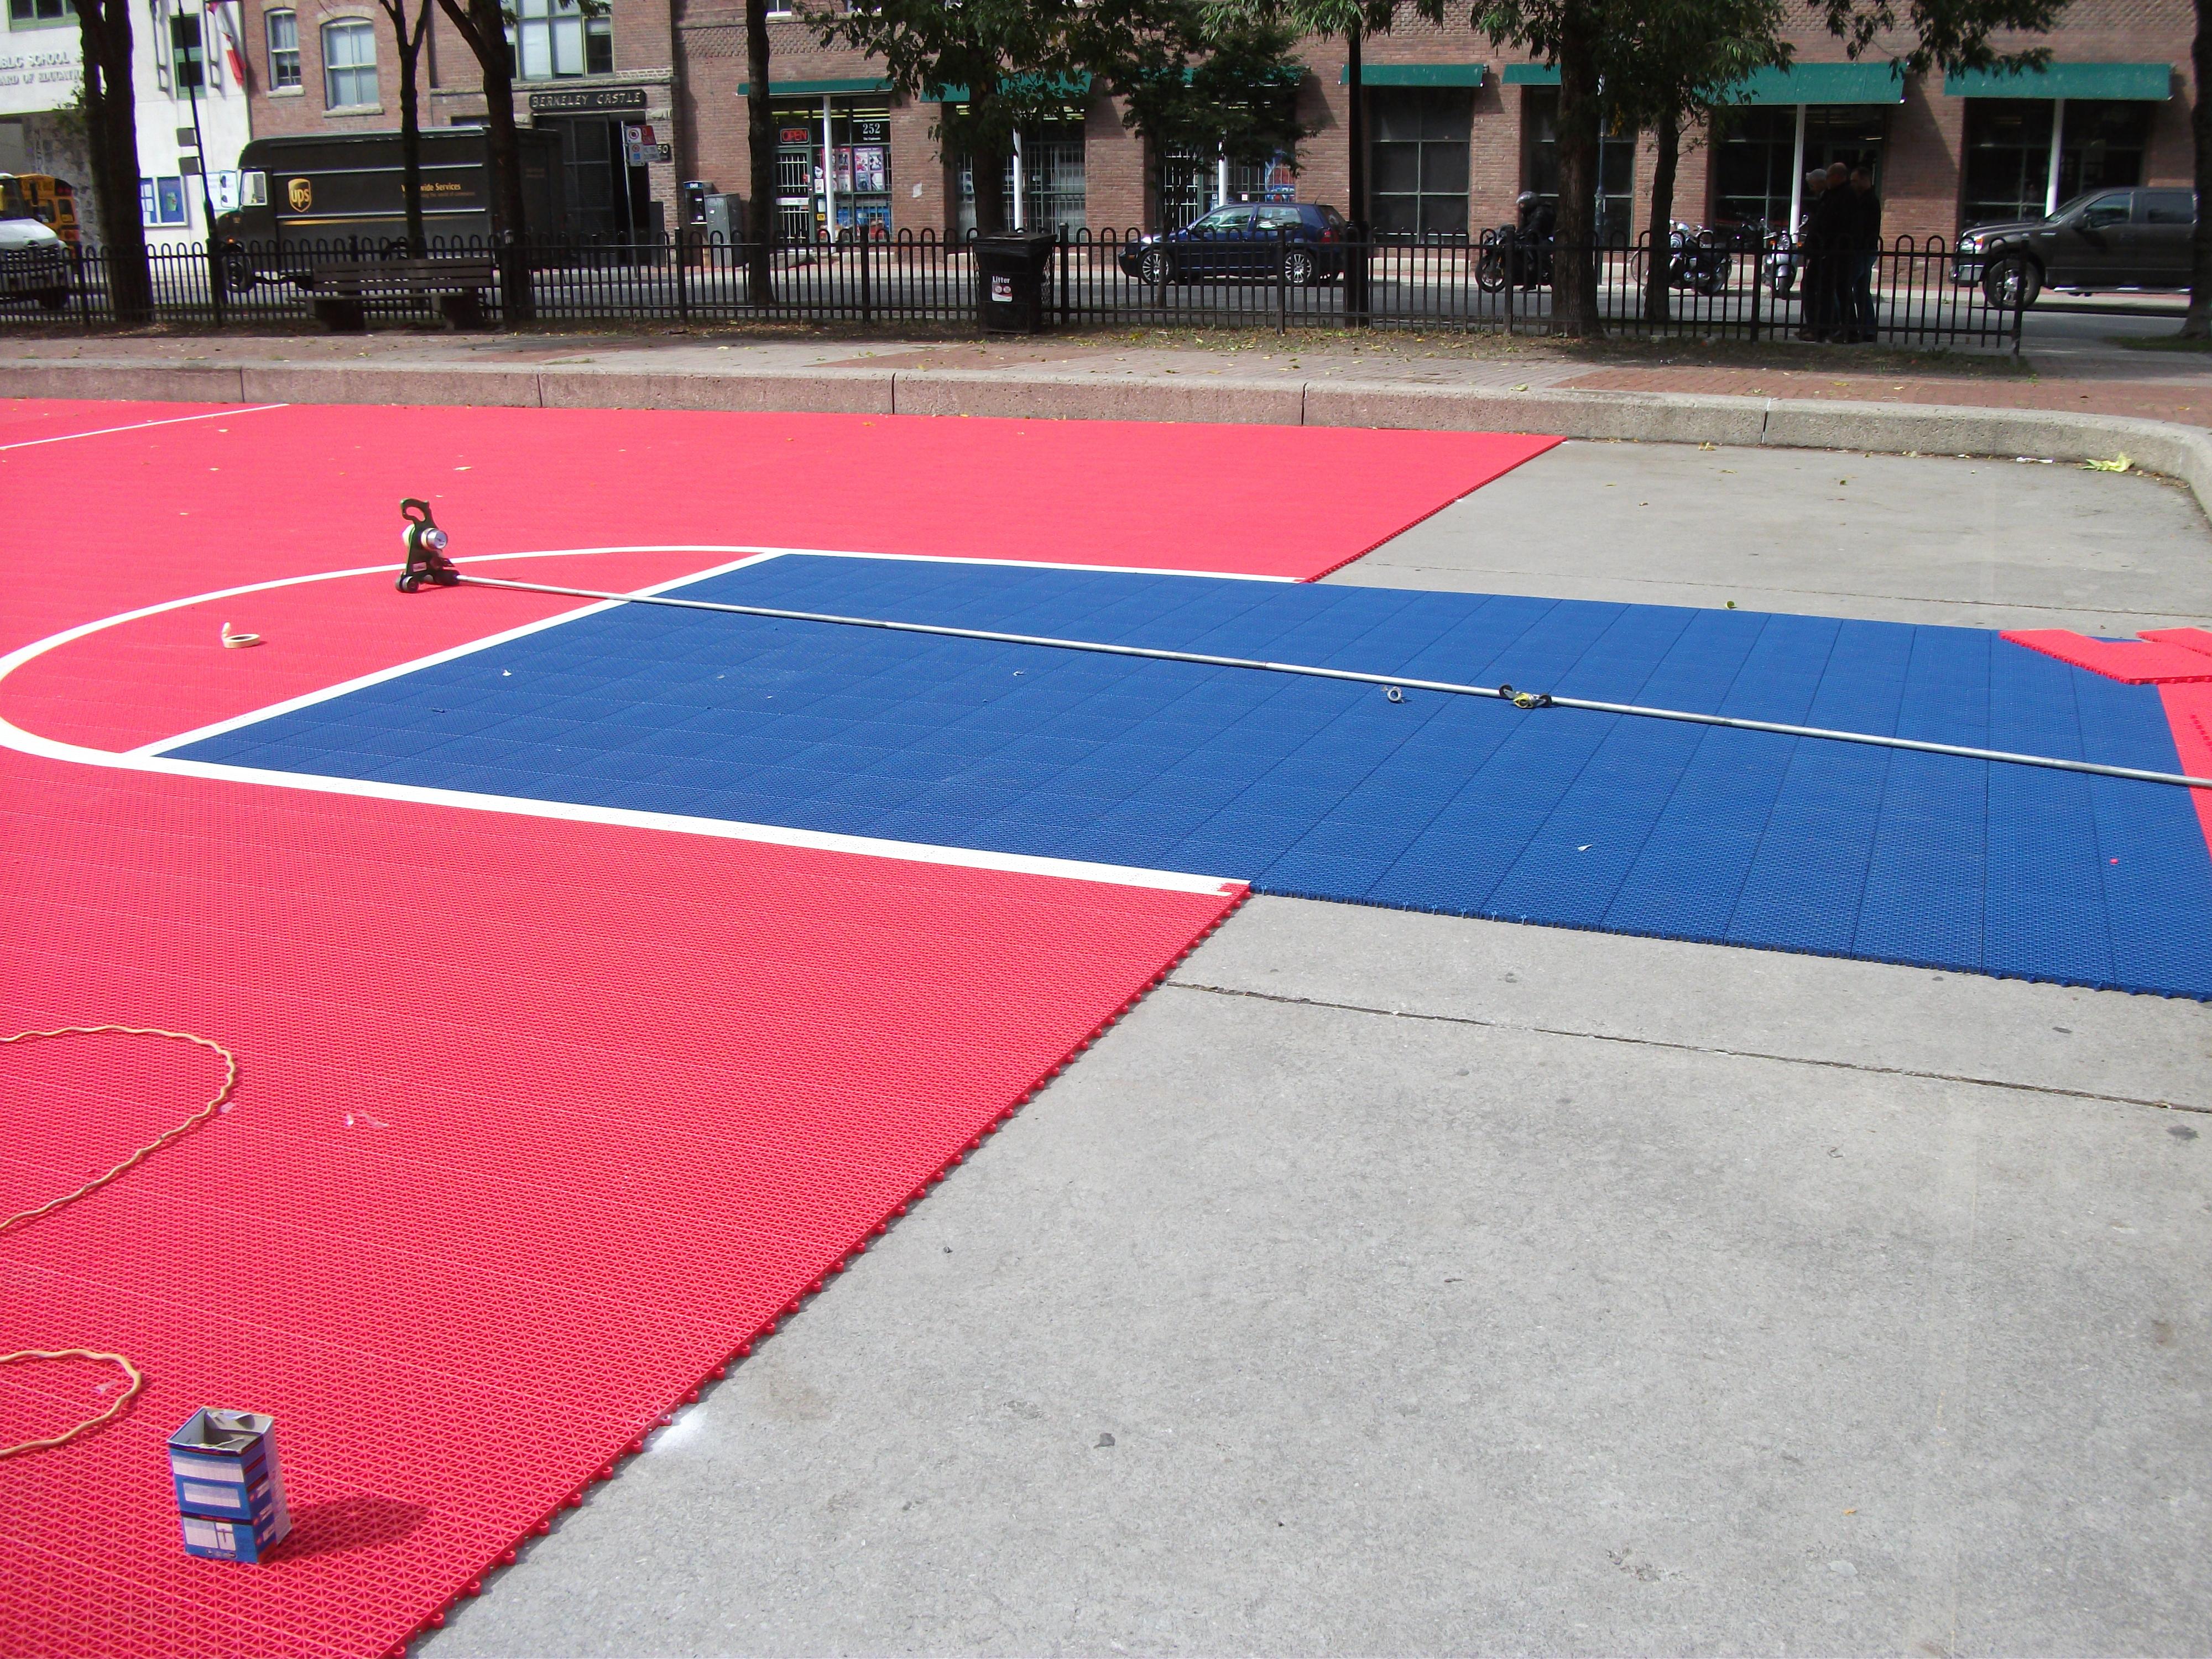 File $22 000 Basketball Court Tiles 2010 10 03 c JPG Wikimedia